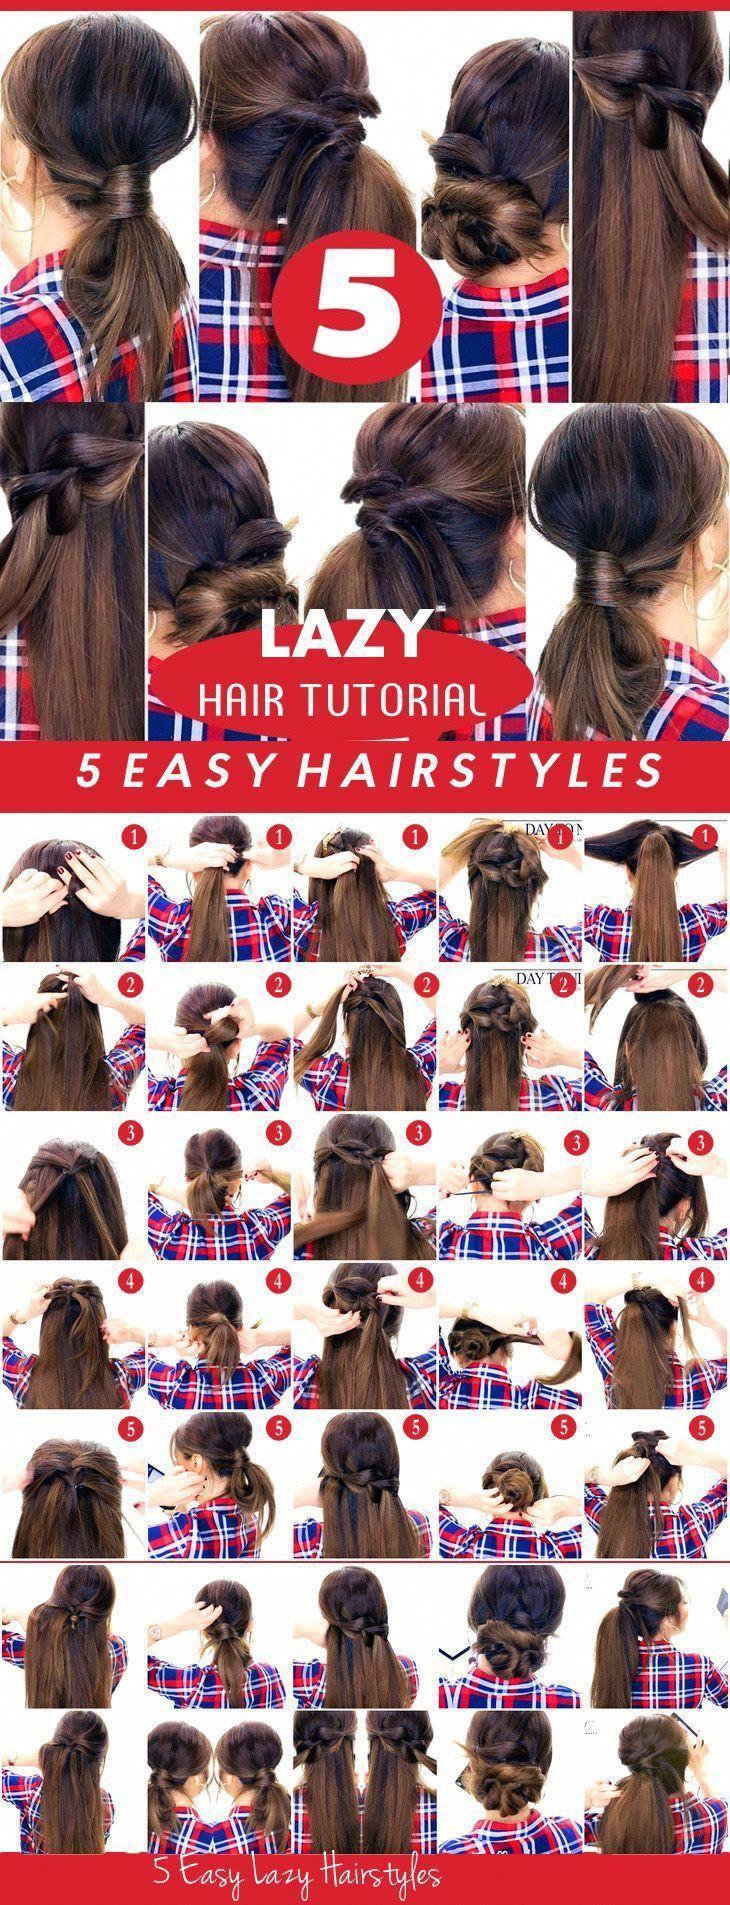 #Days #Easy #Easy Hairstyles lazy #easyhairstylesforwork #Hairstyles